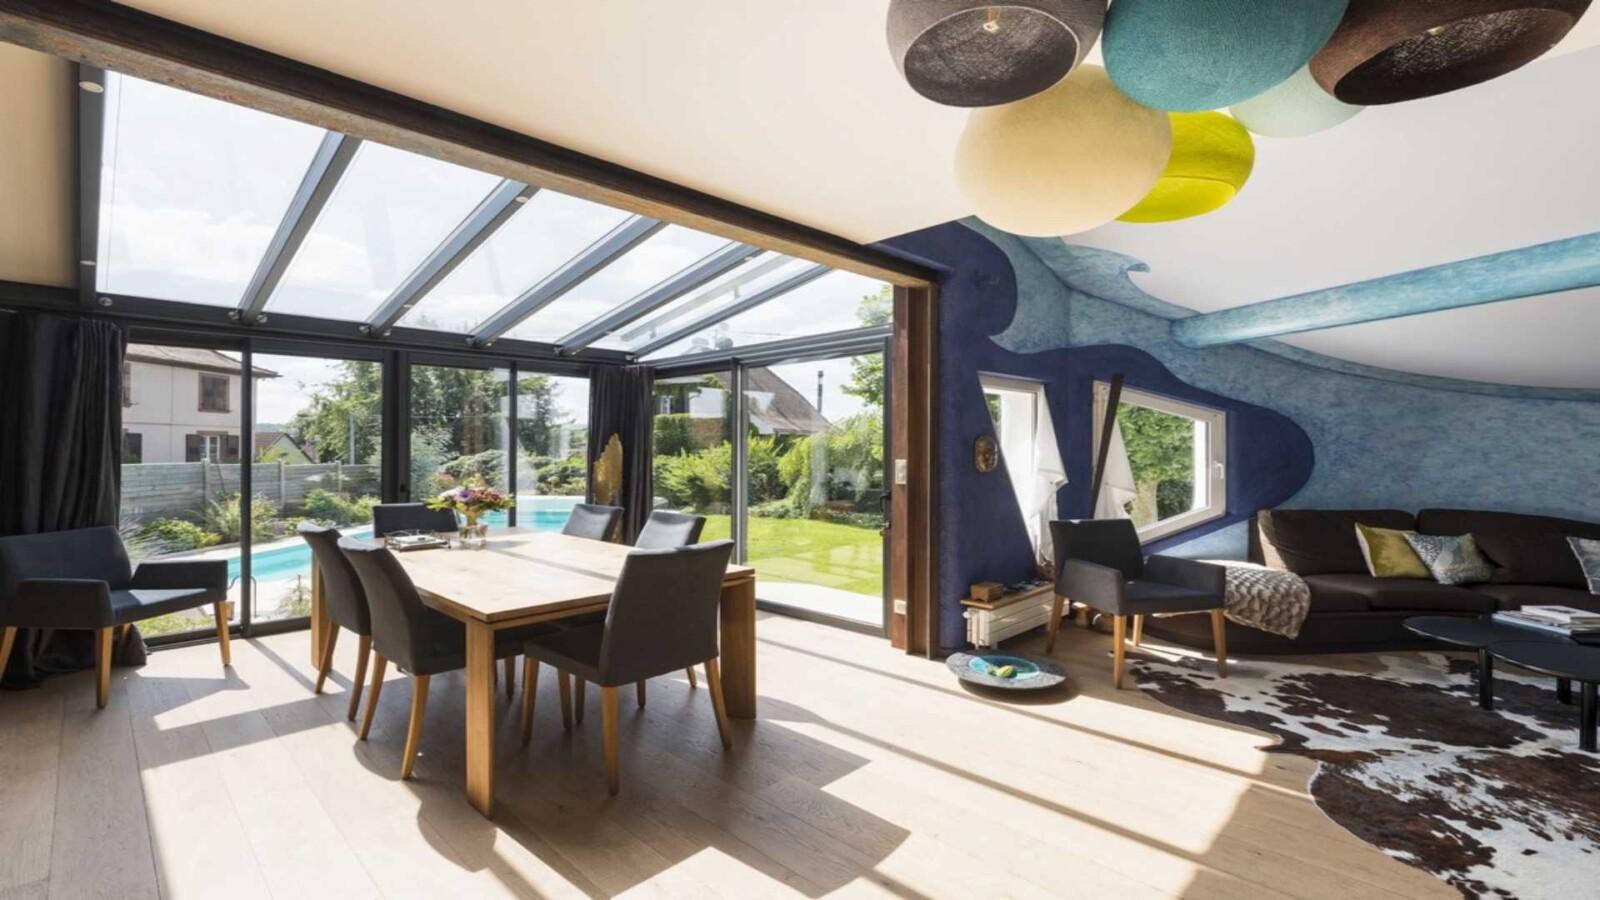 veranda-gris-anthracite-toit-vitre-salle-a-manger-salon